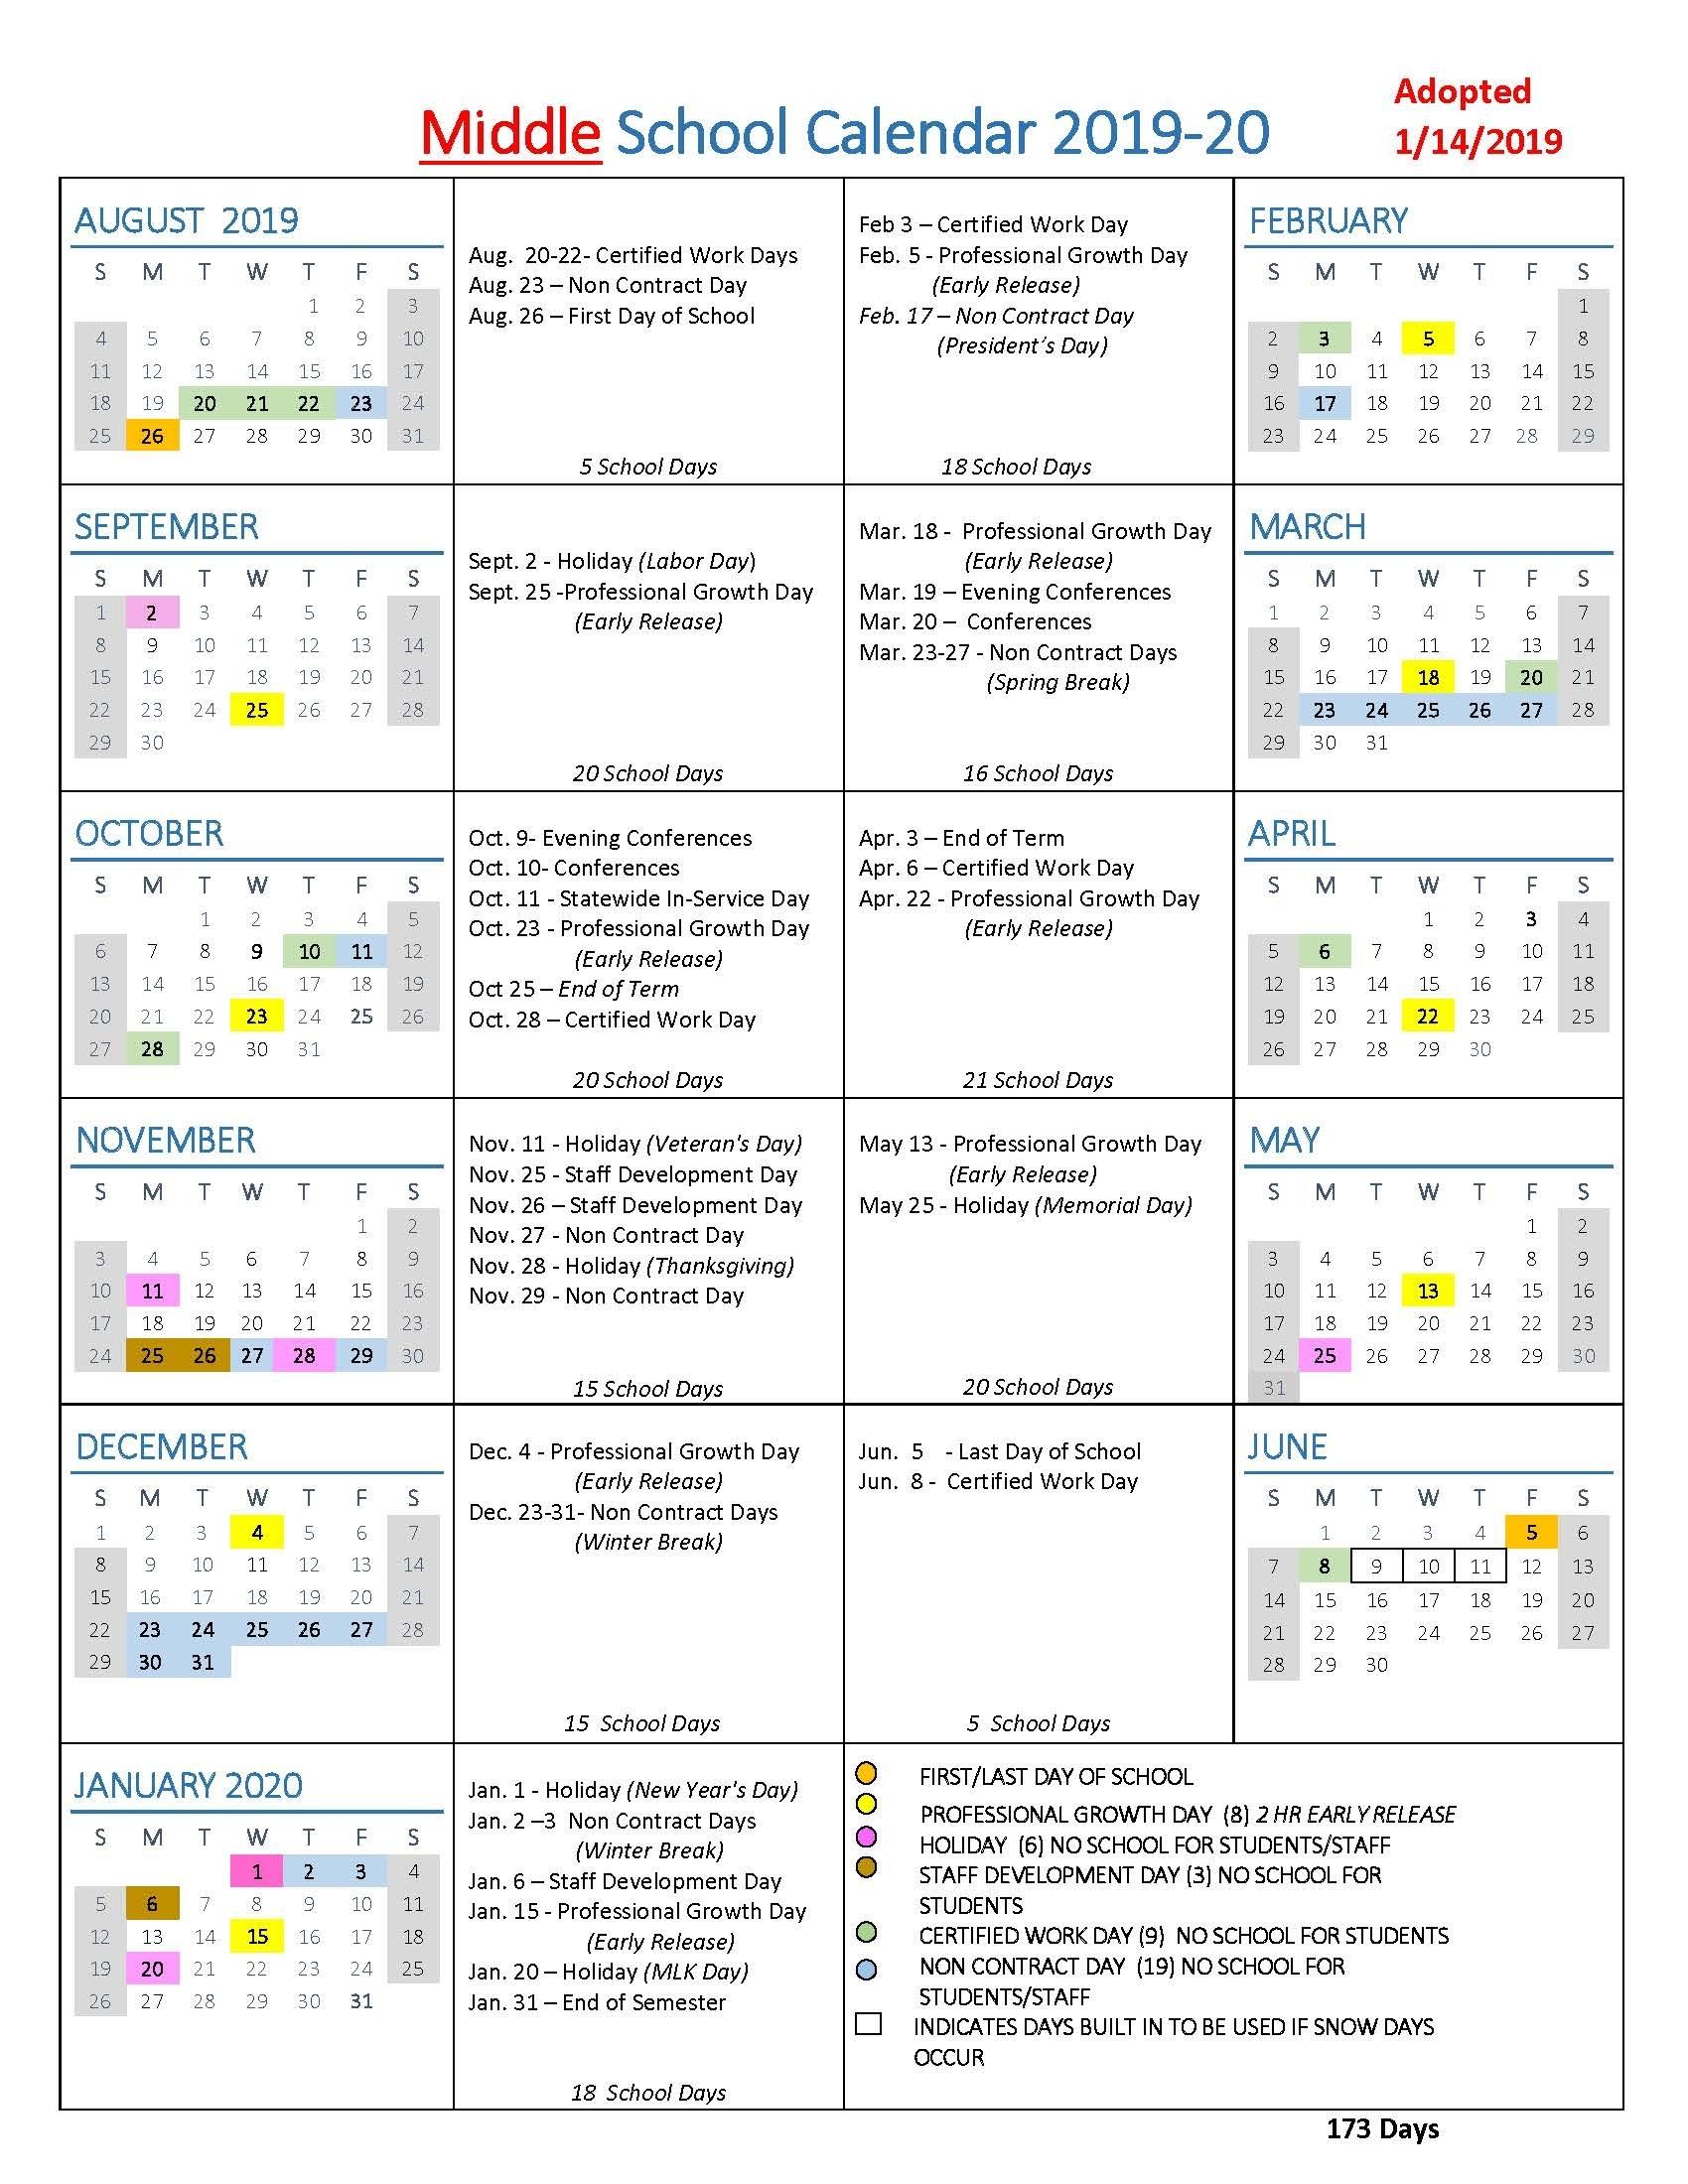 School Year Calendars / Wlwv School Calendars intended for Special Days Calendar 2019-2020